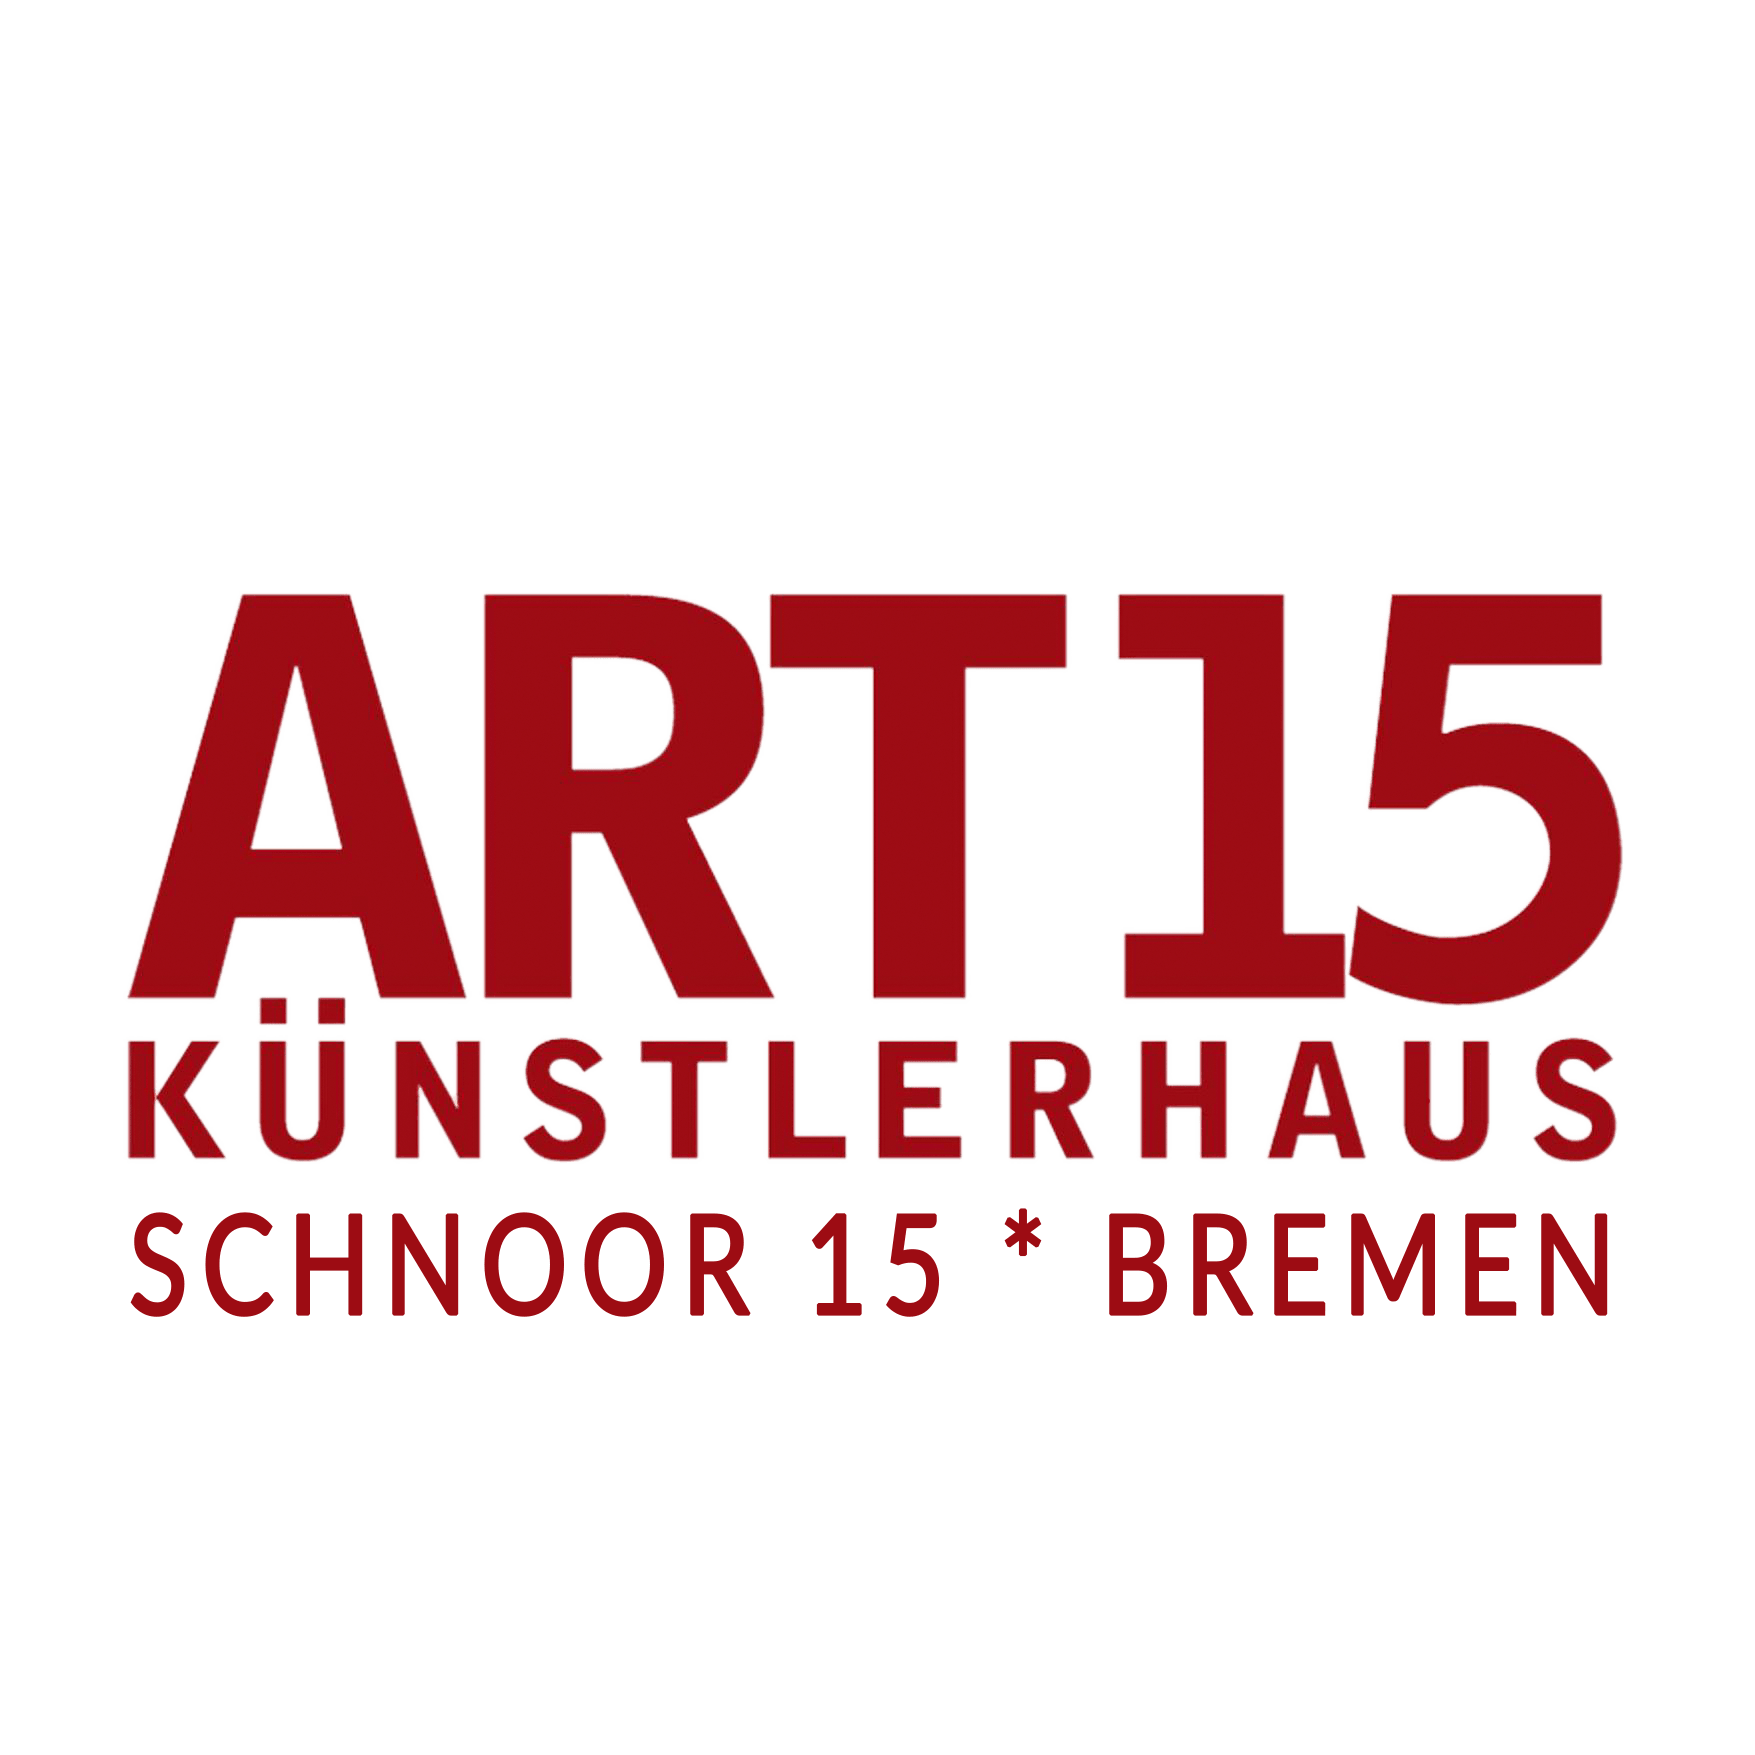 ART15 Künstlerhaus